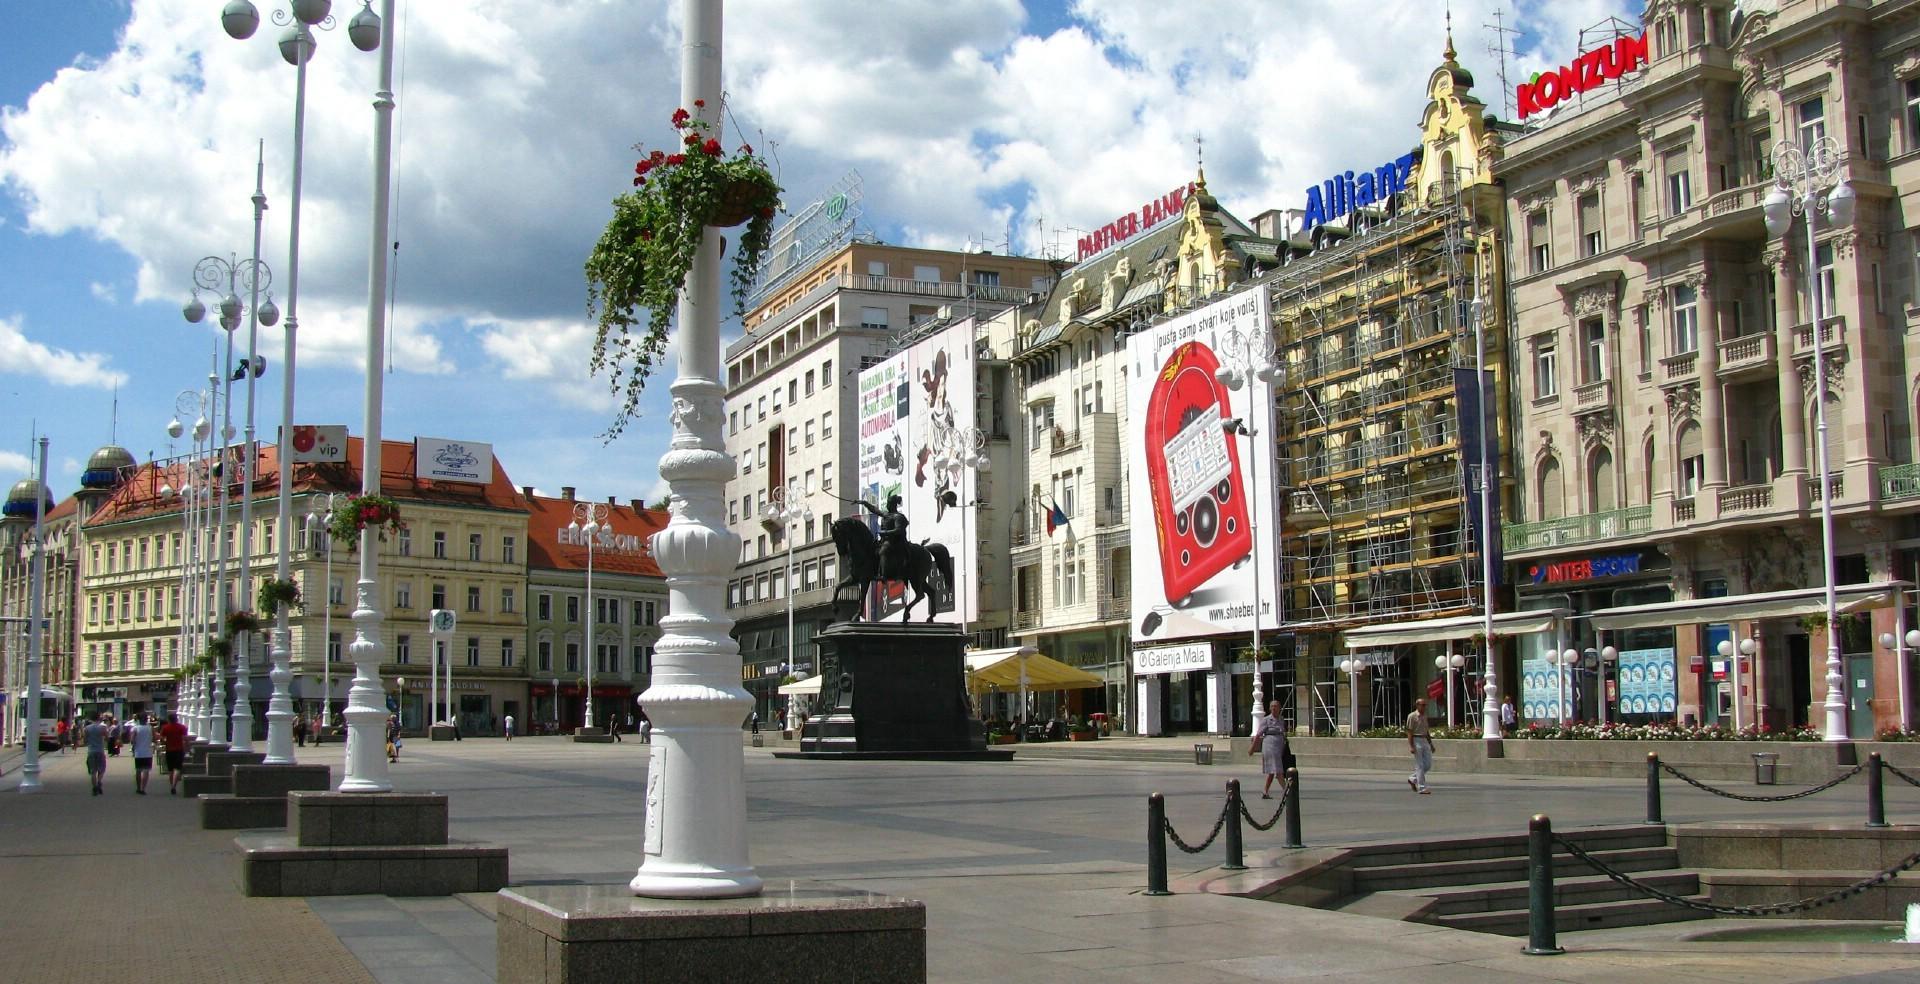 zagreb town center